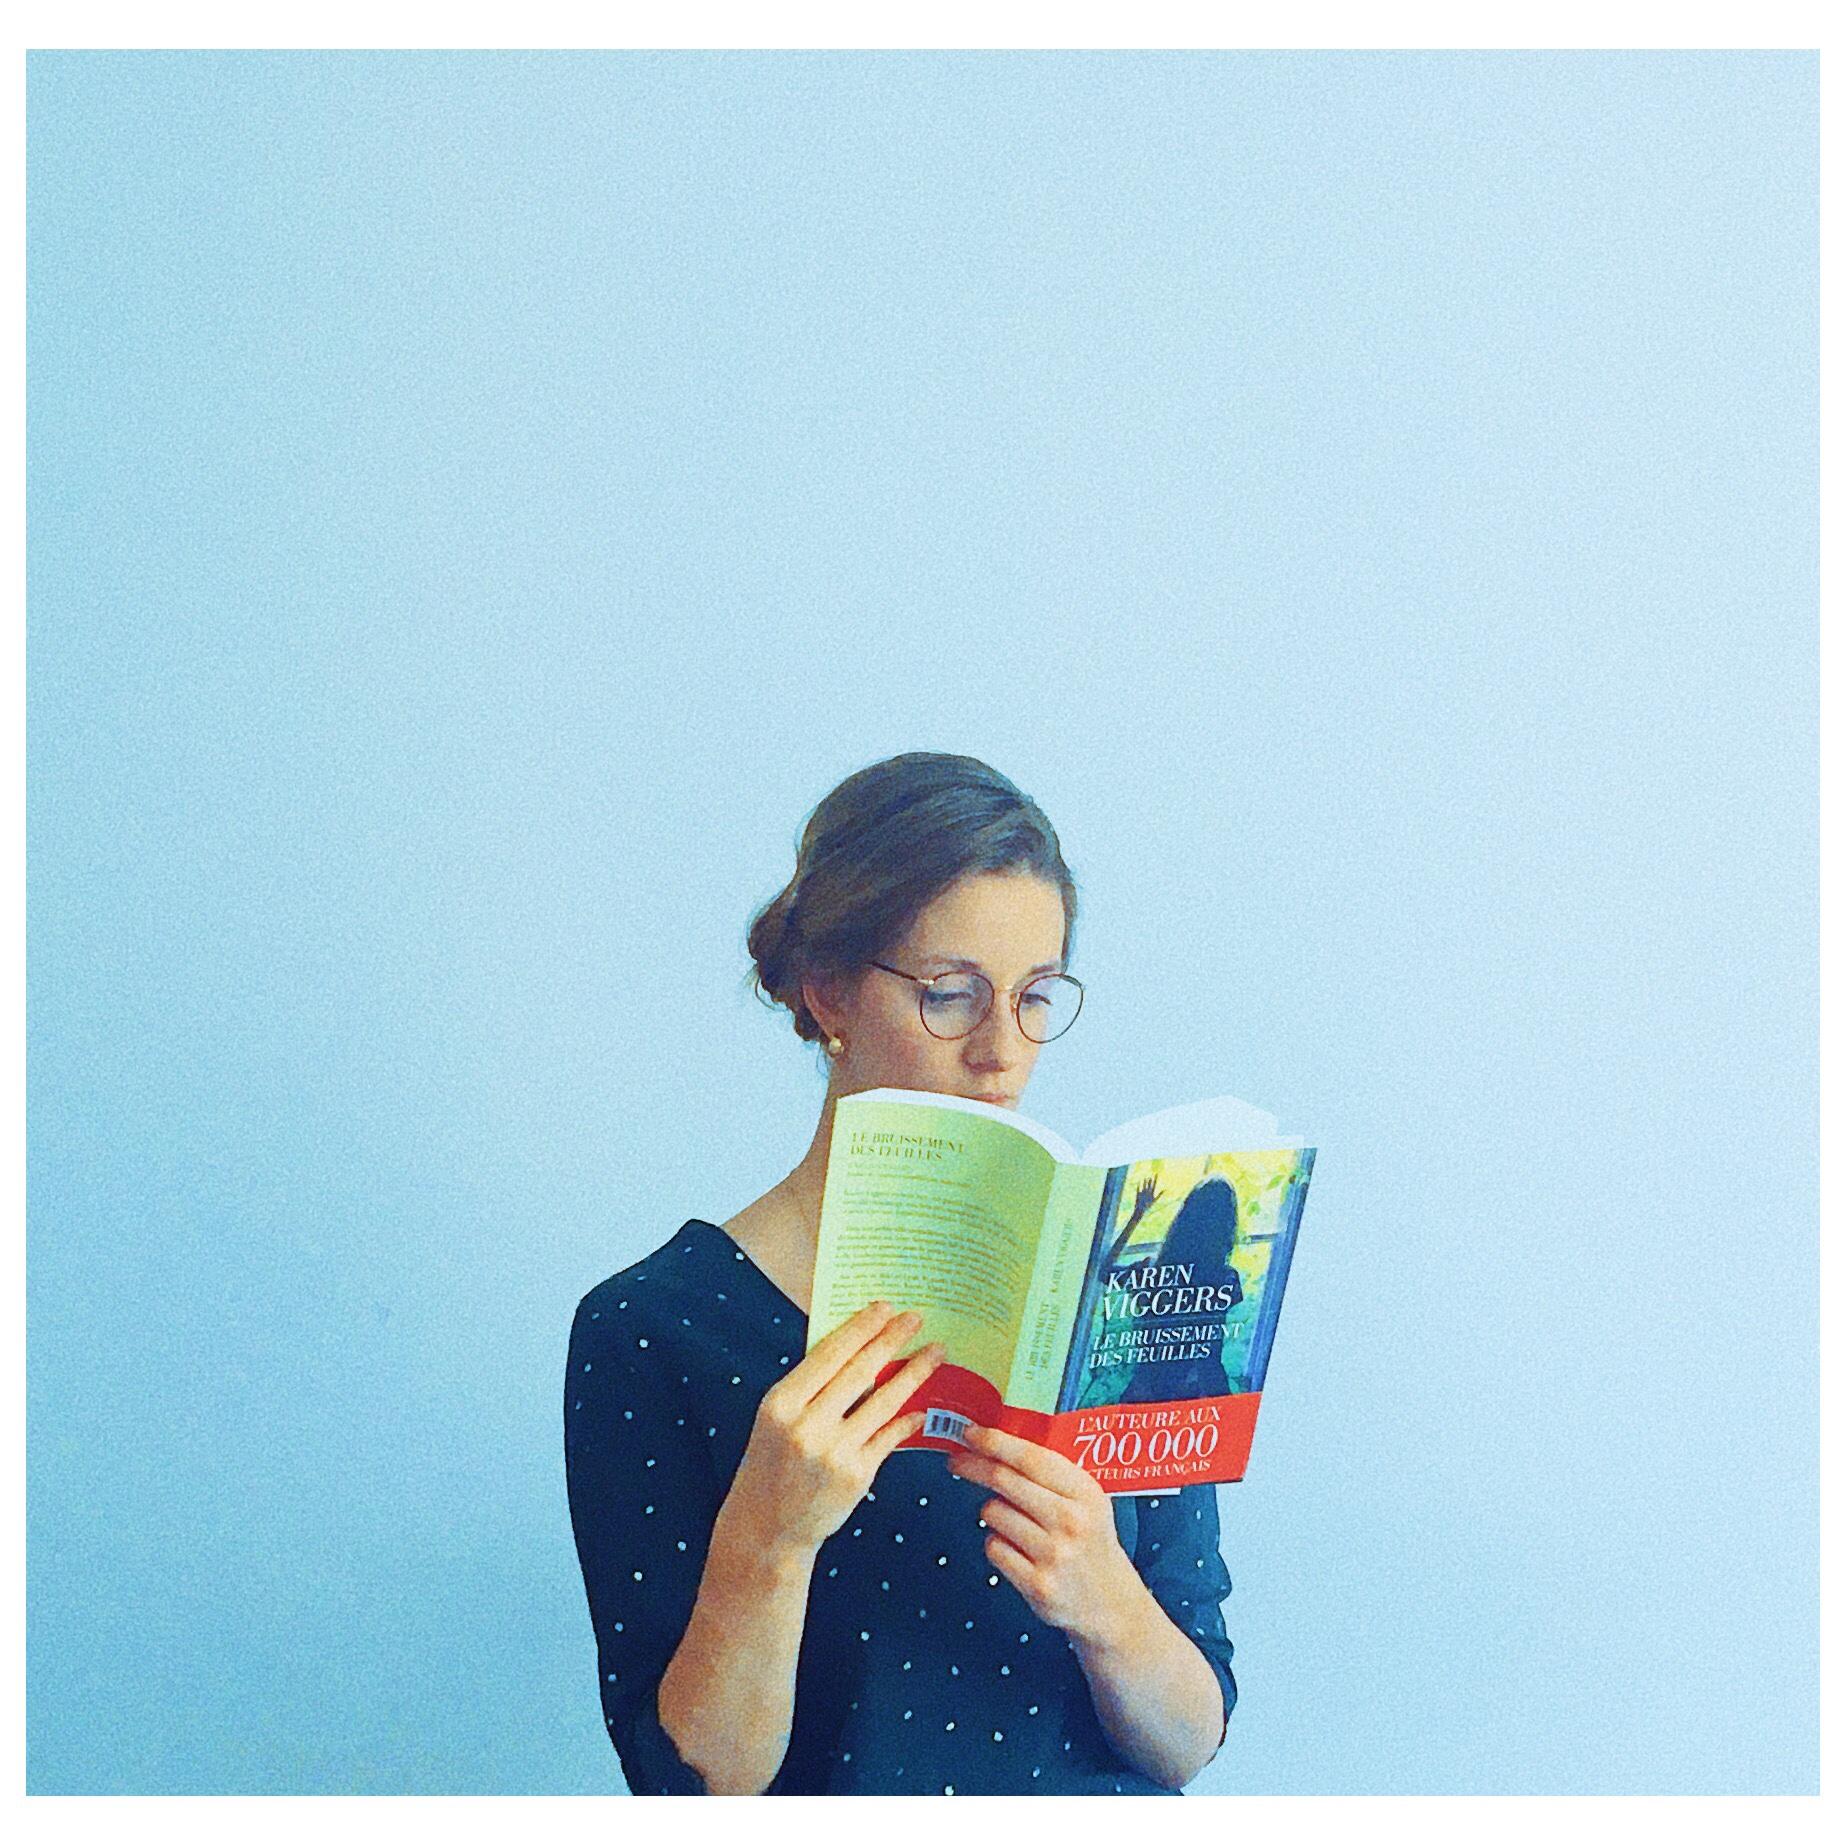 Le Bruissement des feuilles Karen Viggers Editions Les Escales 2019 The Unamed Bookshelf